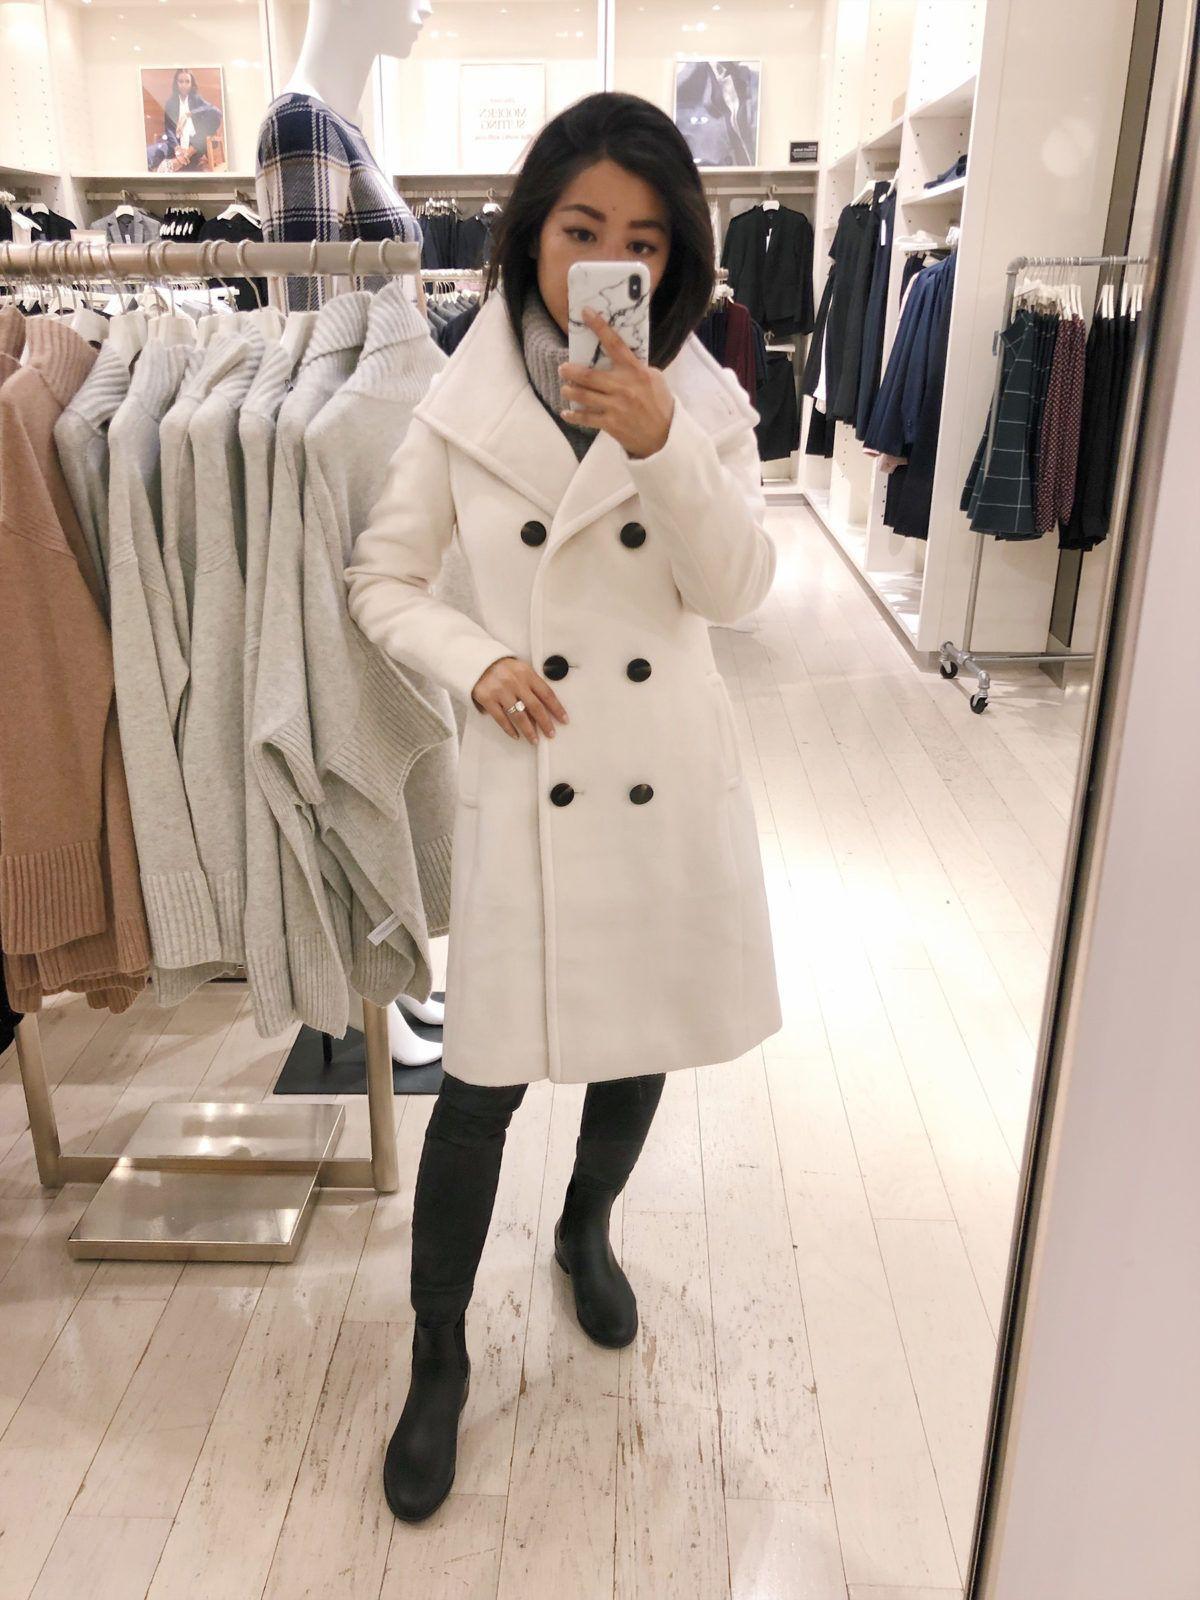 Ann Taylor Petite Winter Coat Try Ons On Sale Petite Winter Coats Wool Coat Outfit White Wool Coat [ 1600 x 1200 Pixel ]